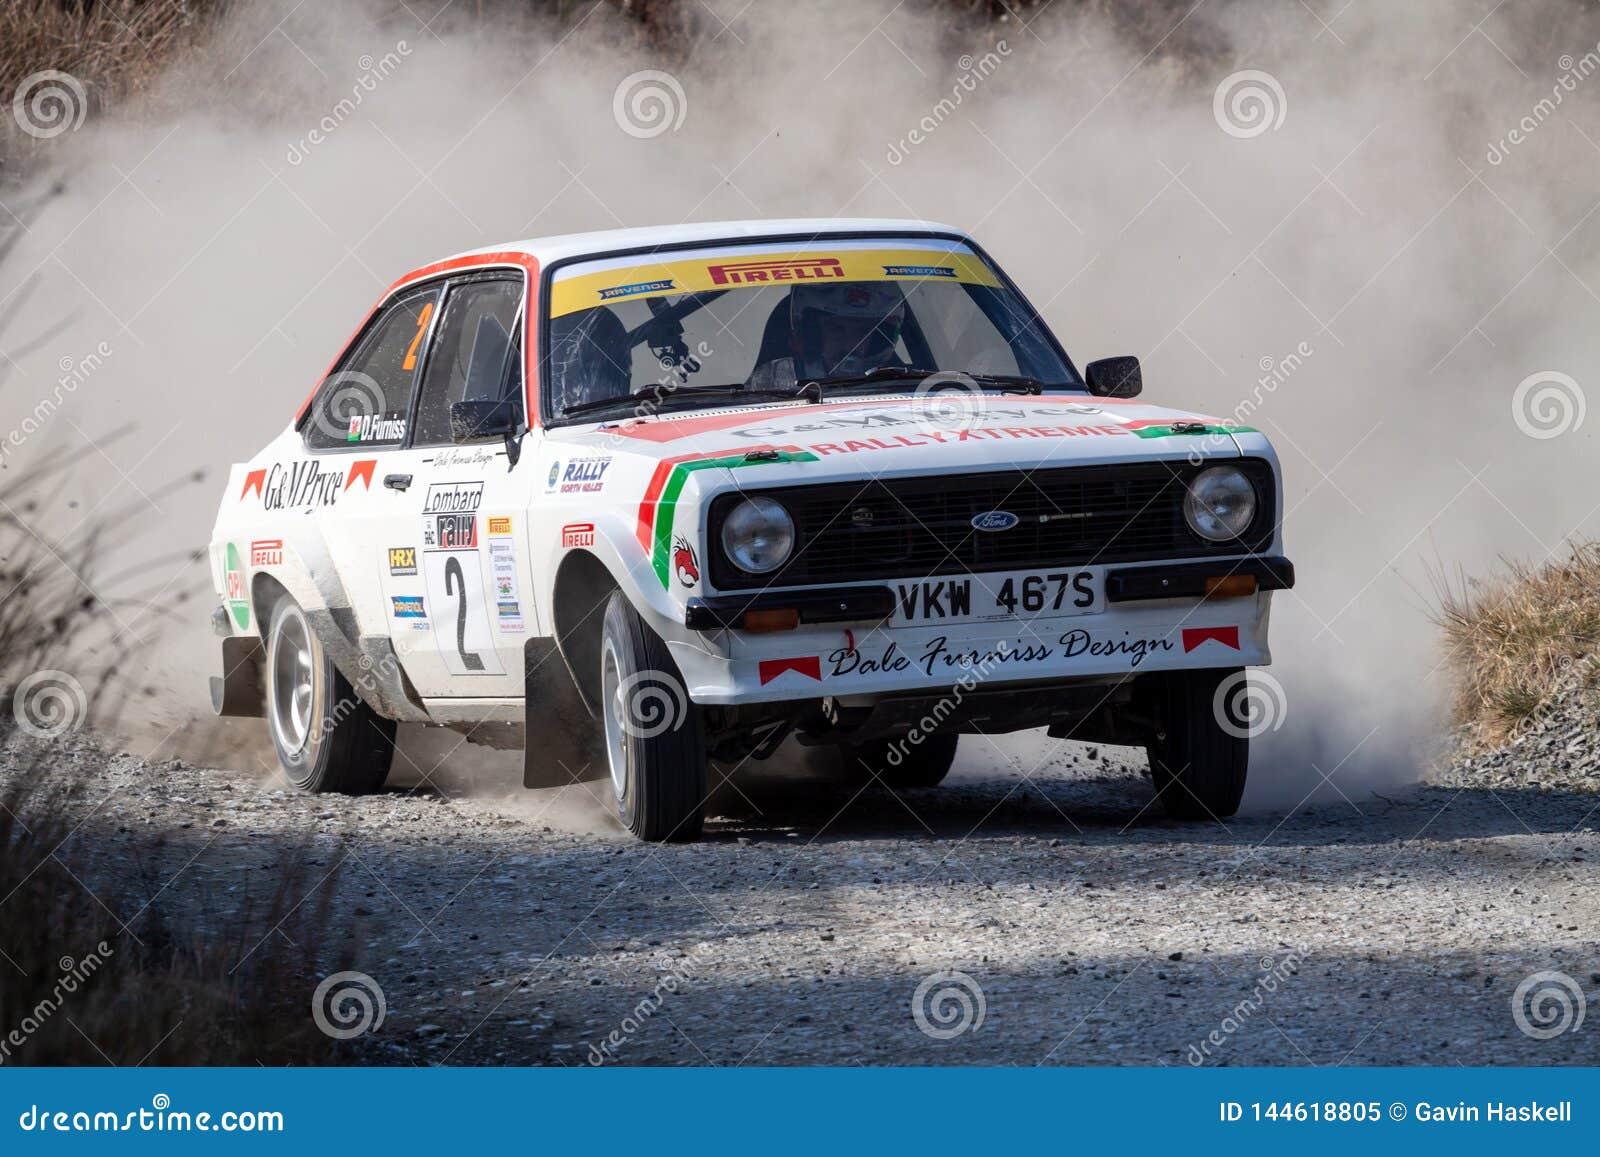 Ford Mkii Escort Rally Car